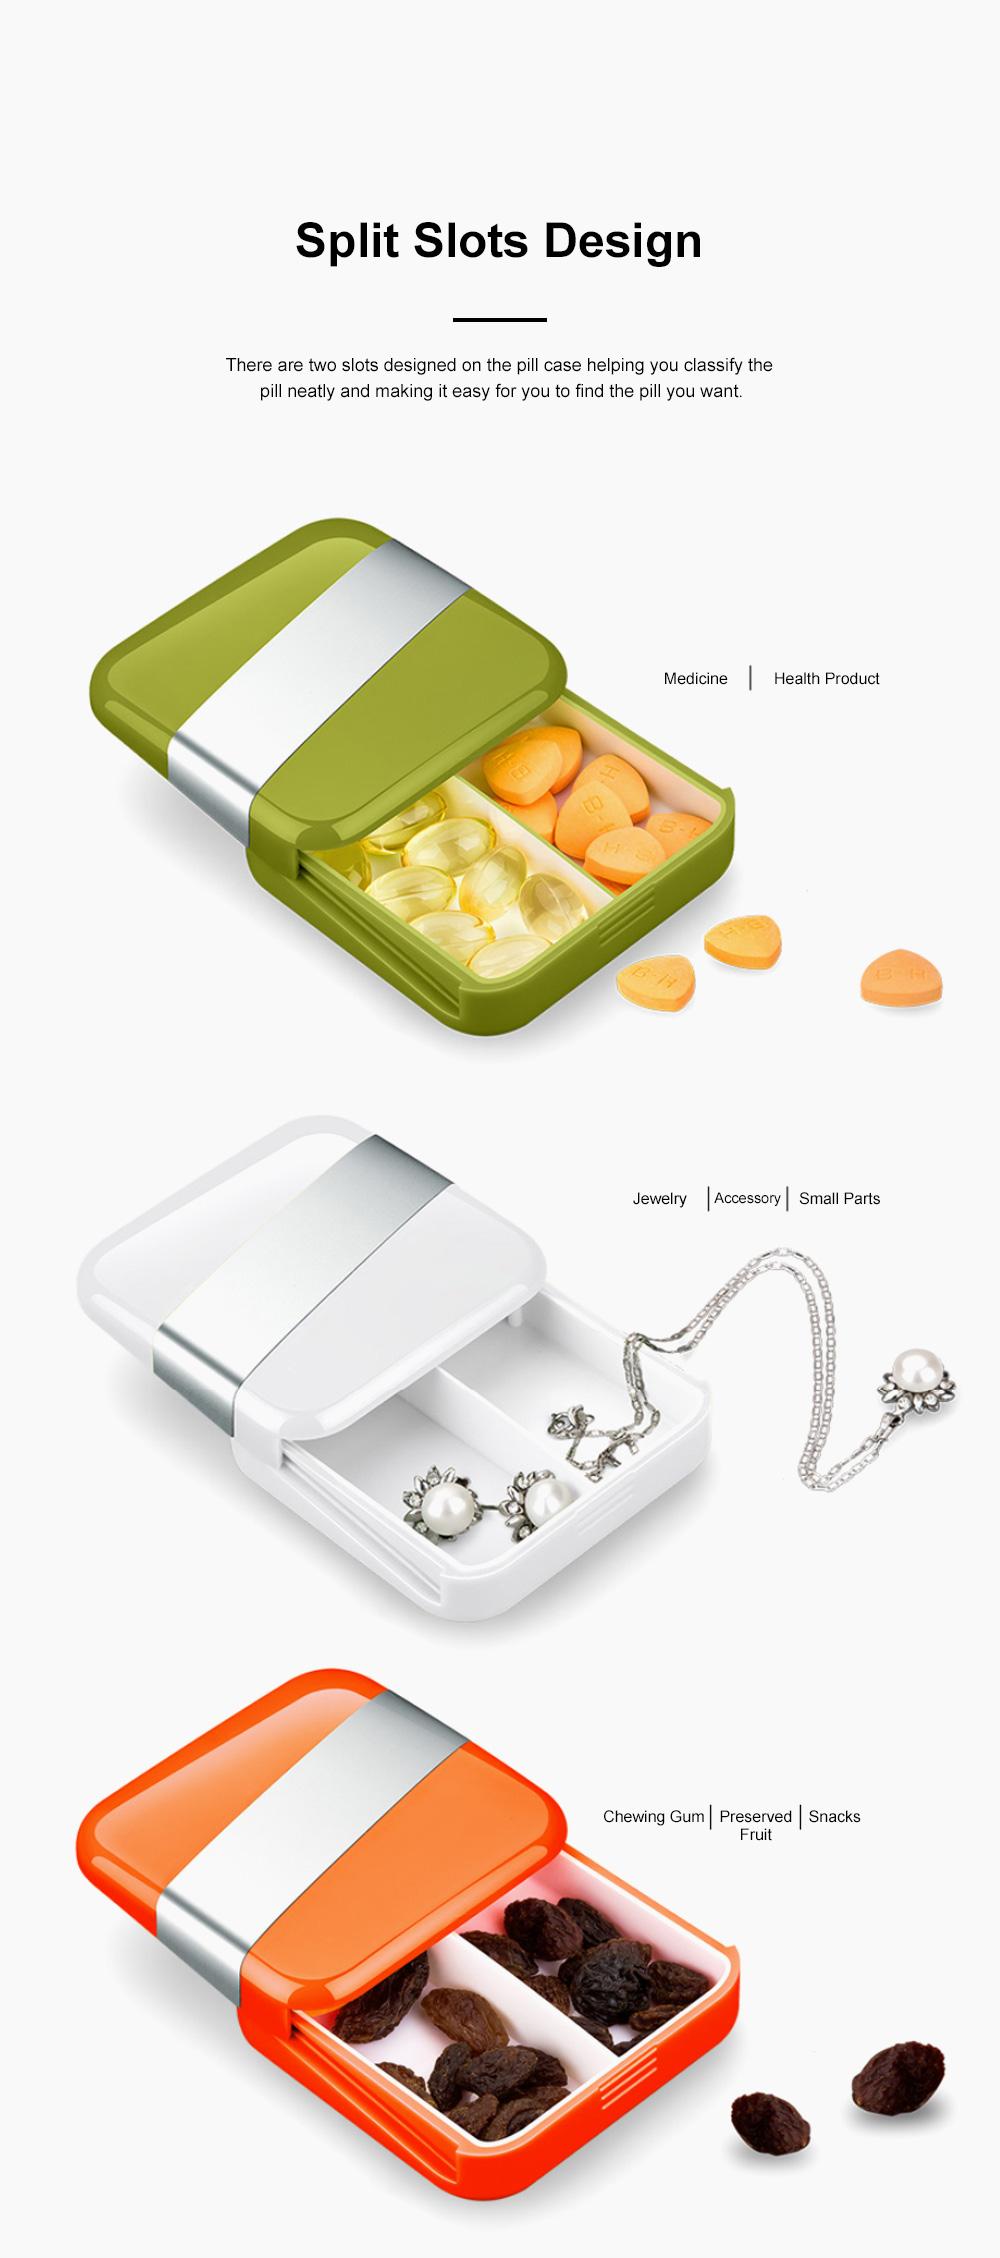 Minimalist Portable Creative Push-pull Split Slots Food-grade ABS Little Pill Case Jewelry Chewing Gum Storage Box 4